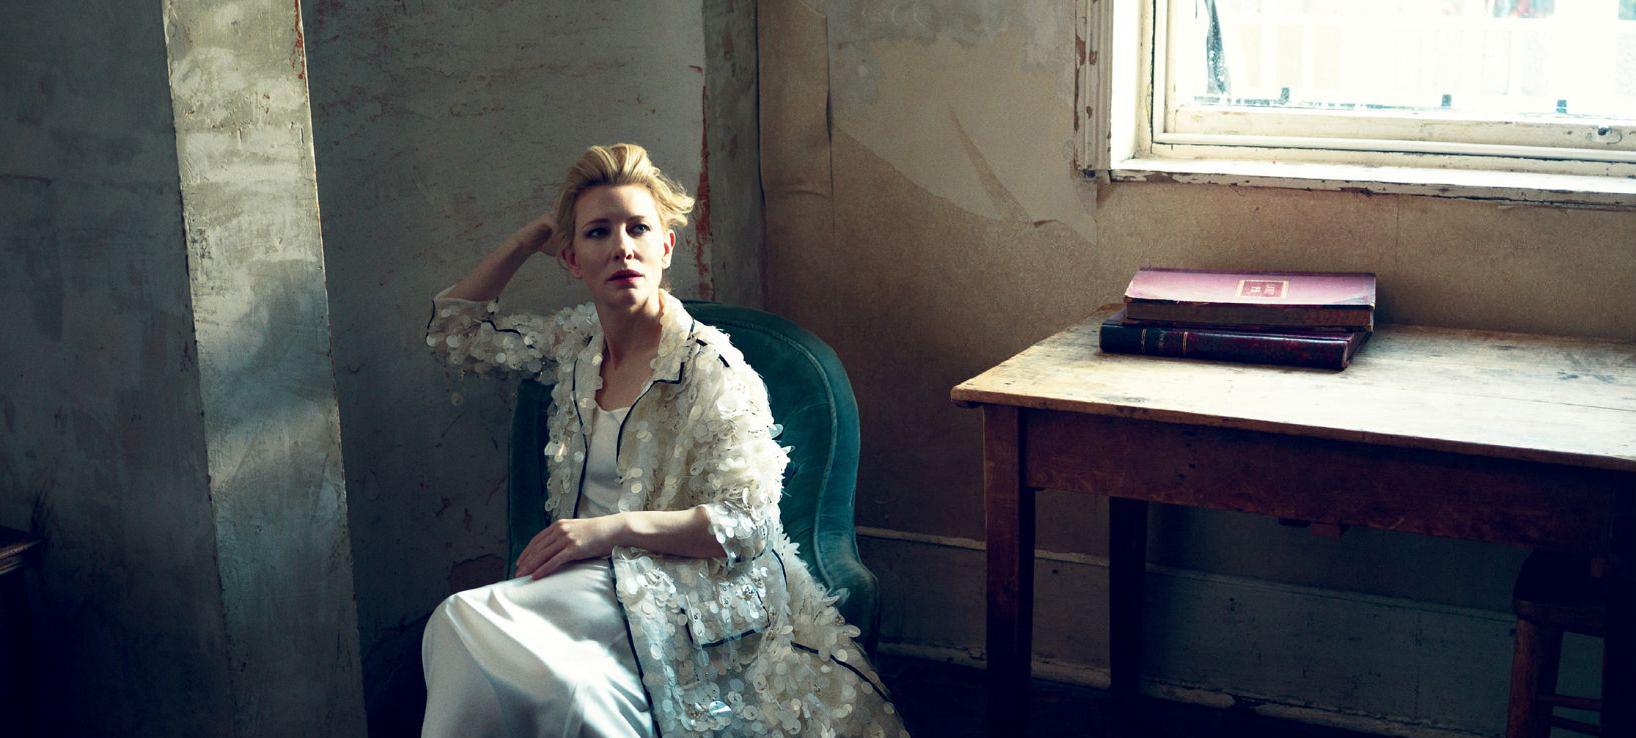 Photoshoot update: Egoiste Magazine, Variety, AACTA Awards and Harper's Bazaar